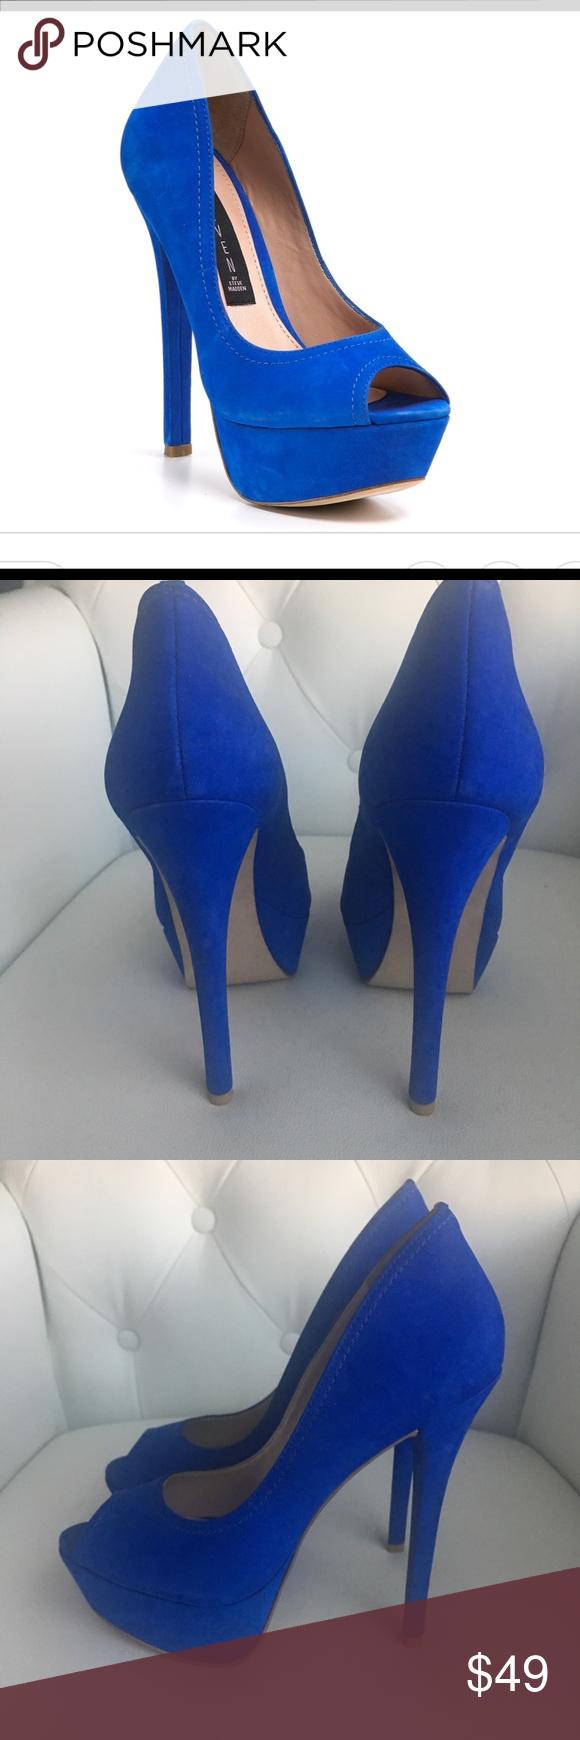 d161c9bc738 Steve Madden Altetude blue nubuck Sz 10 Steve Madden heels sz 10 worn once. Blue  suede. 5 inch heel with 1 inch platform. Comes with original box Steve ...